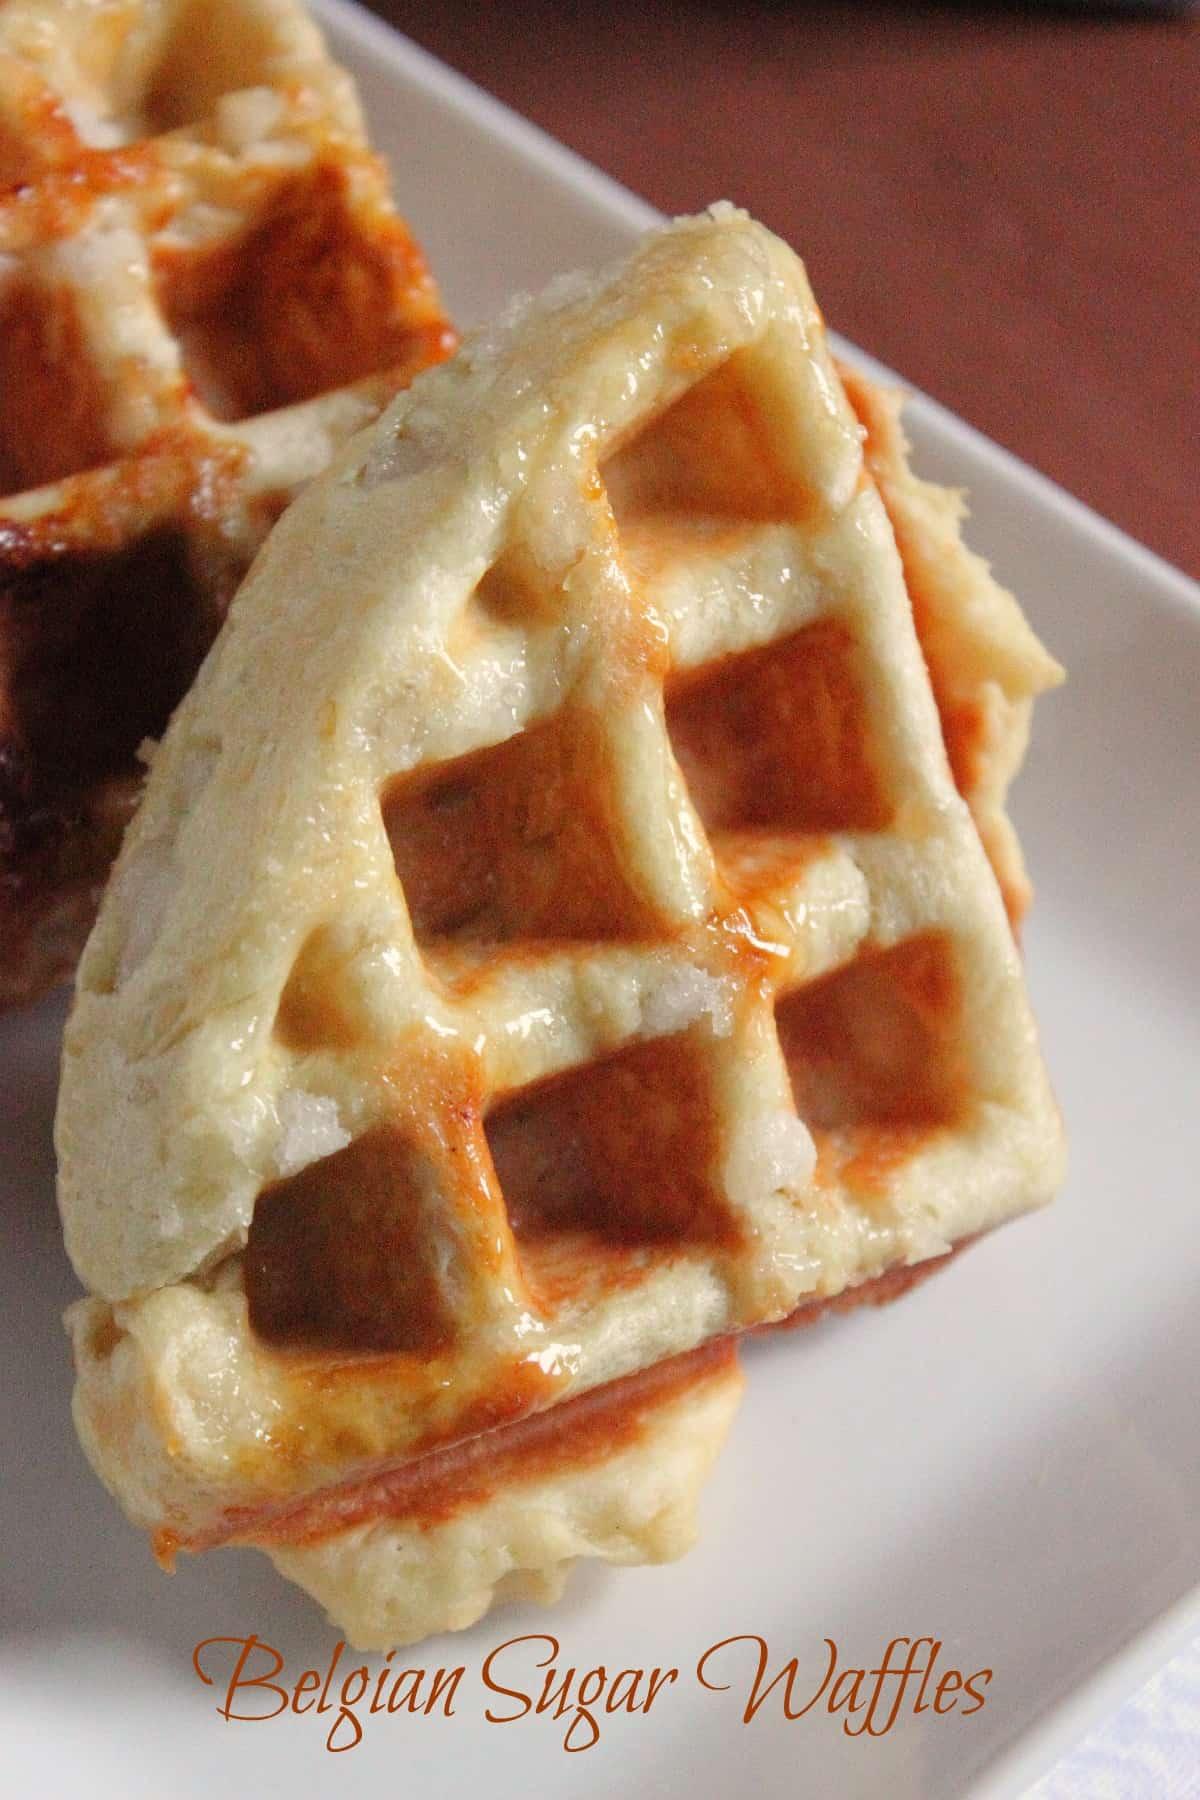 "Liege"" Belgian Sugar Waffles - Brown Sugar"